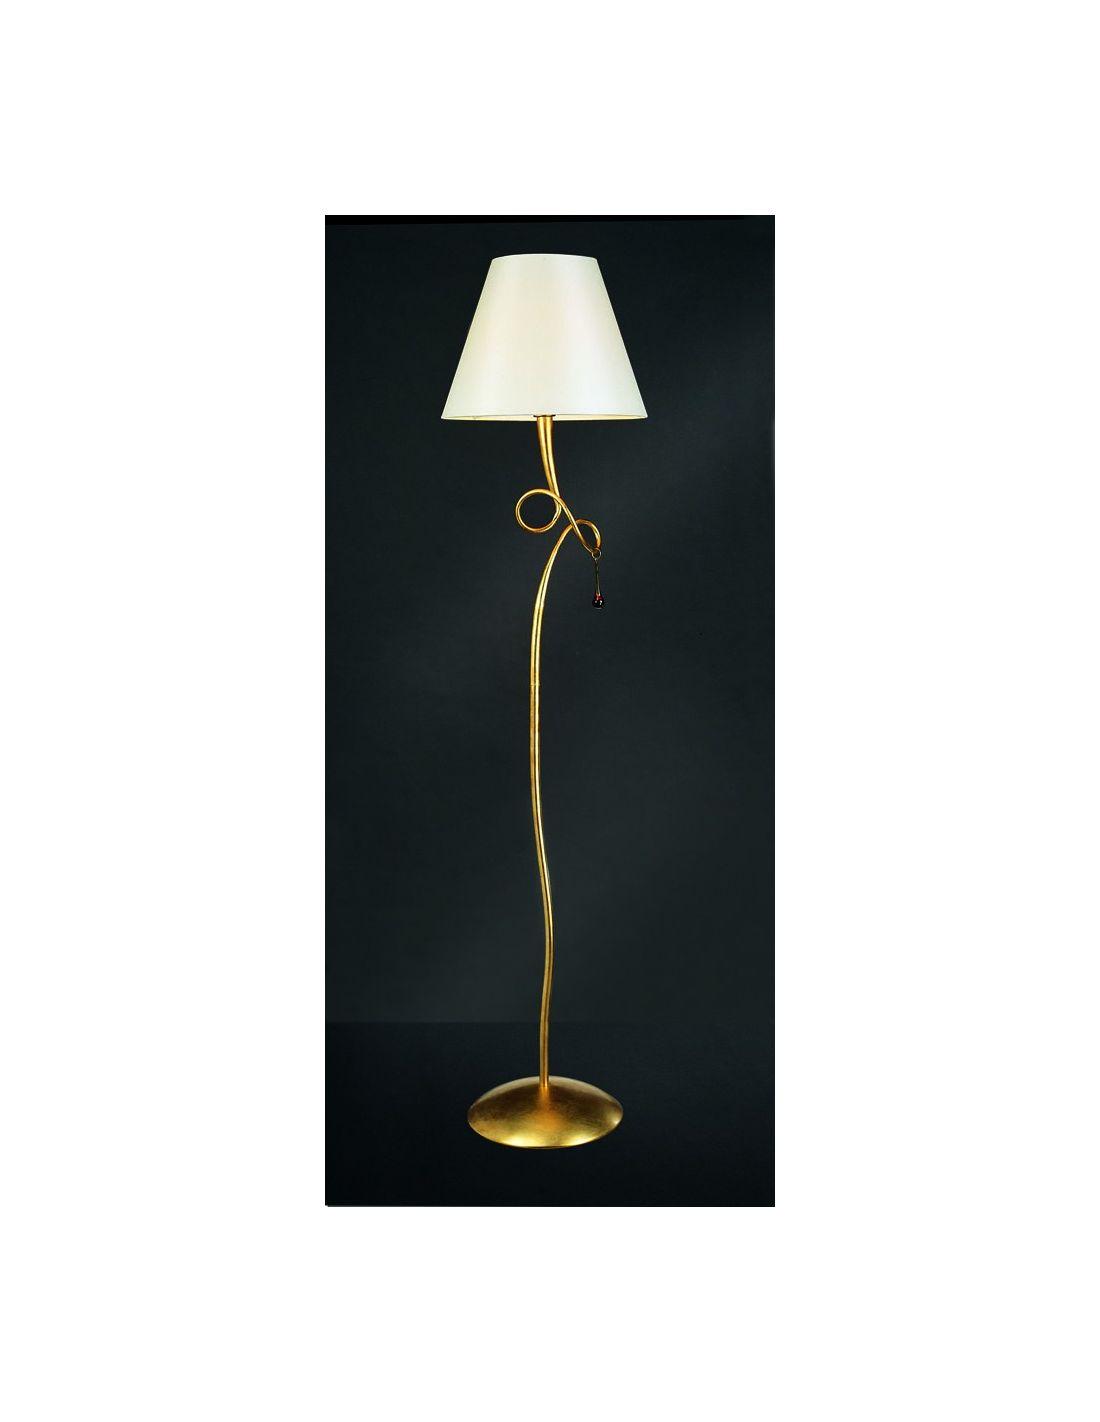 Lamparas de pie doradas lamparas de pie modernas doradas lamparas de pie modernas online - Lamparas de pie clasicas ...